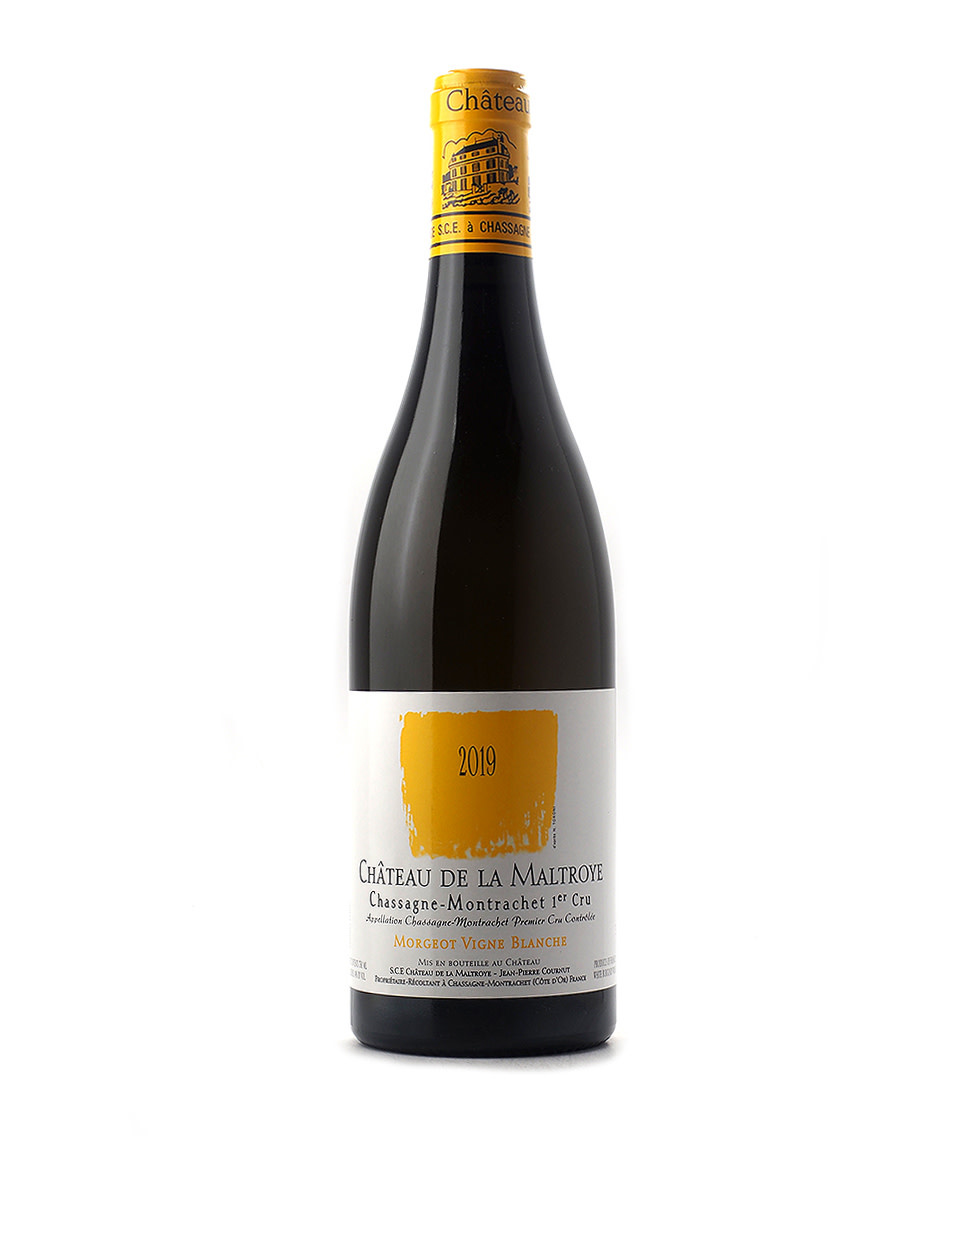 Maltroye Chassagne Montrachet 1er Cru Morgeot Blanc 2019